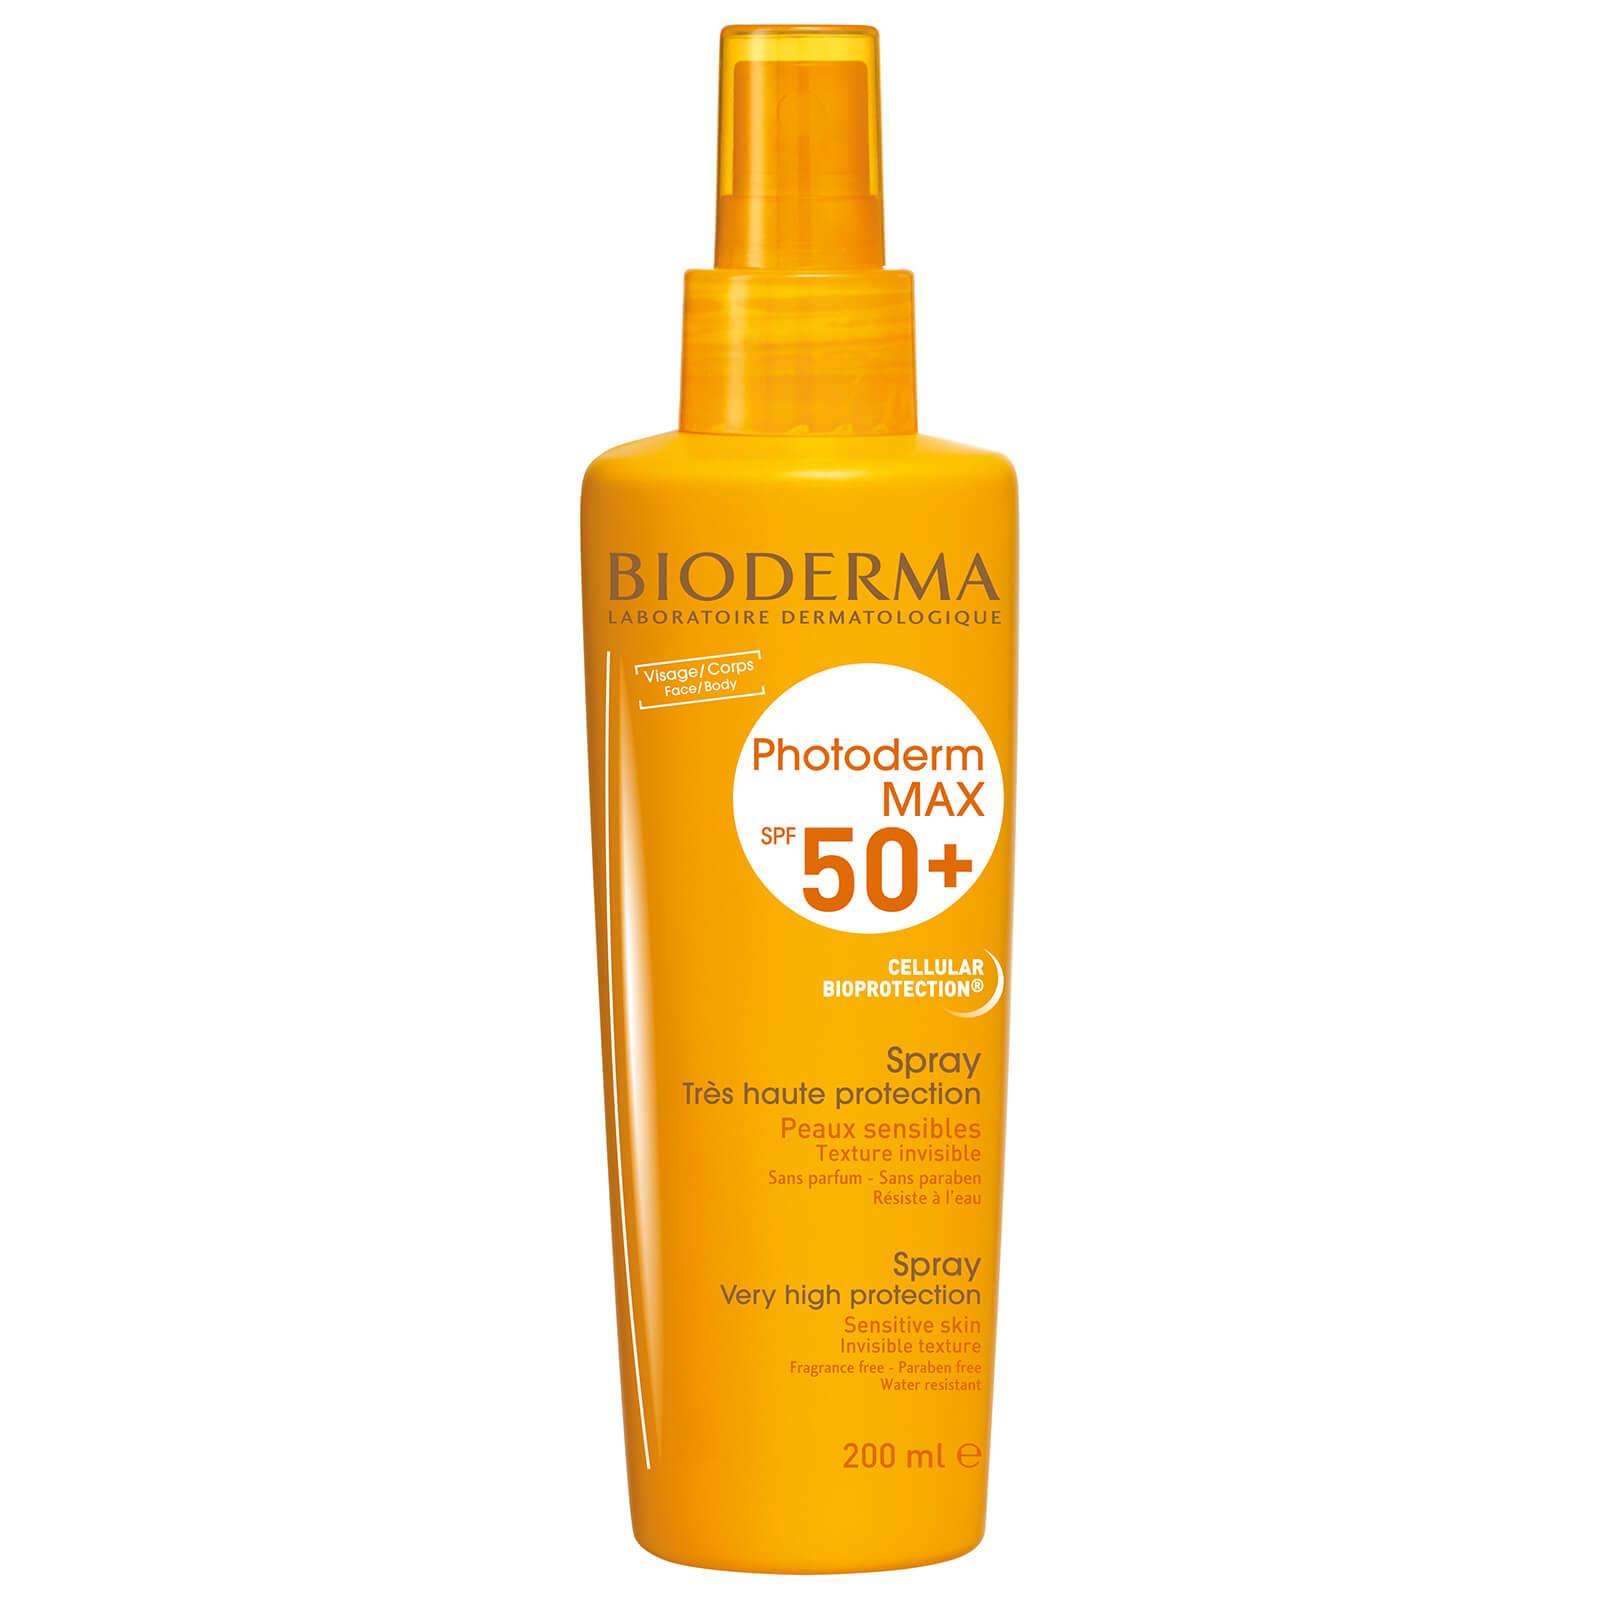 Bioderma Photoderm Max Spray SPF50+ 200ml